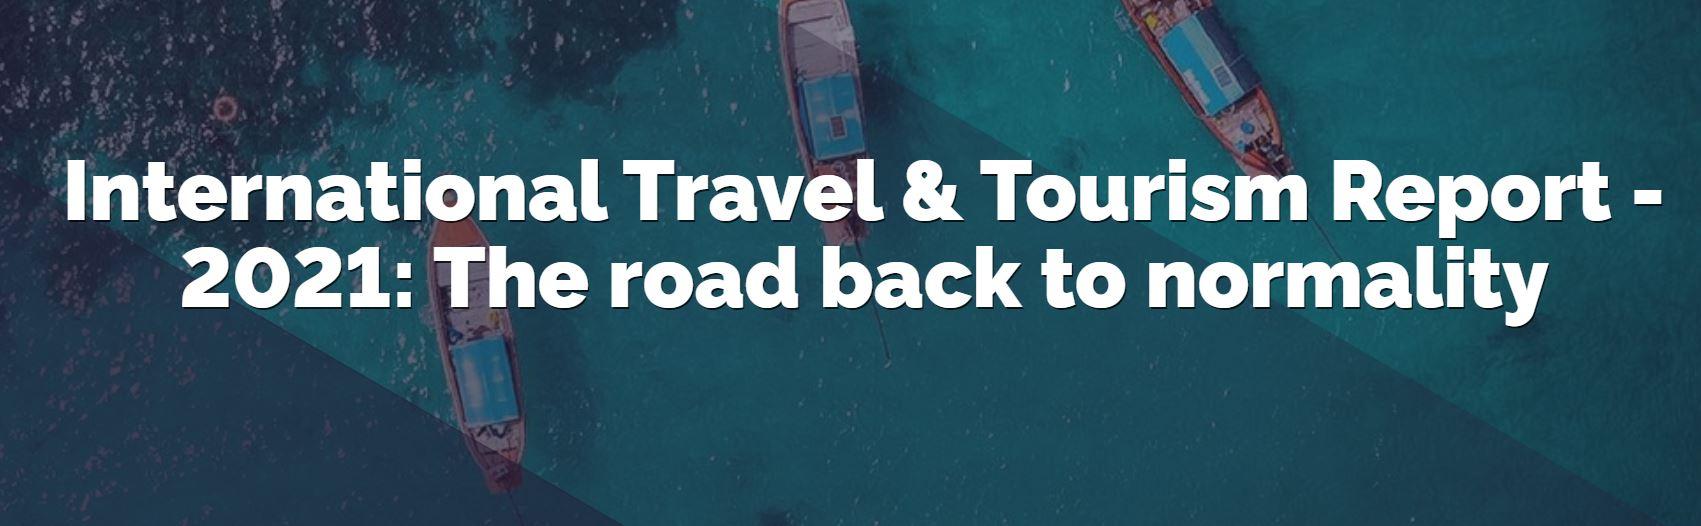 YouGov International Travel & Tourism Report 2021